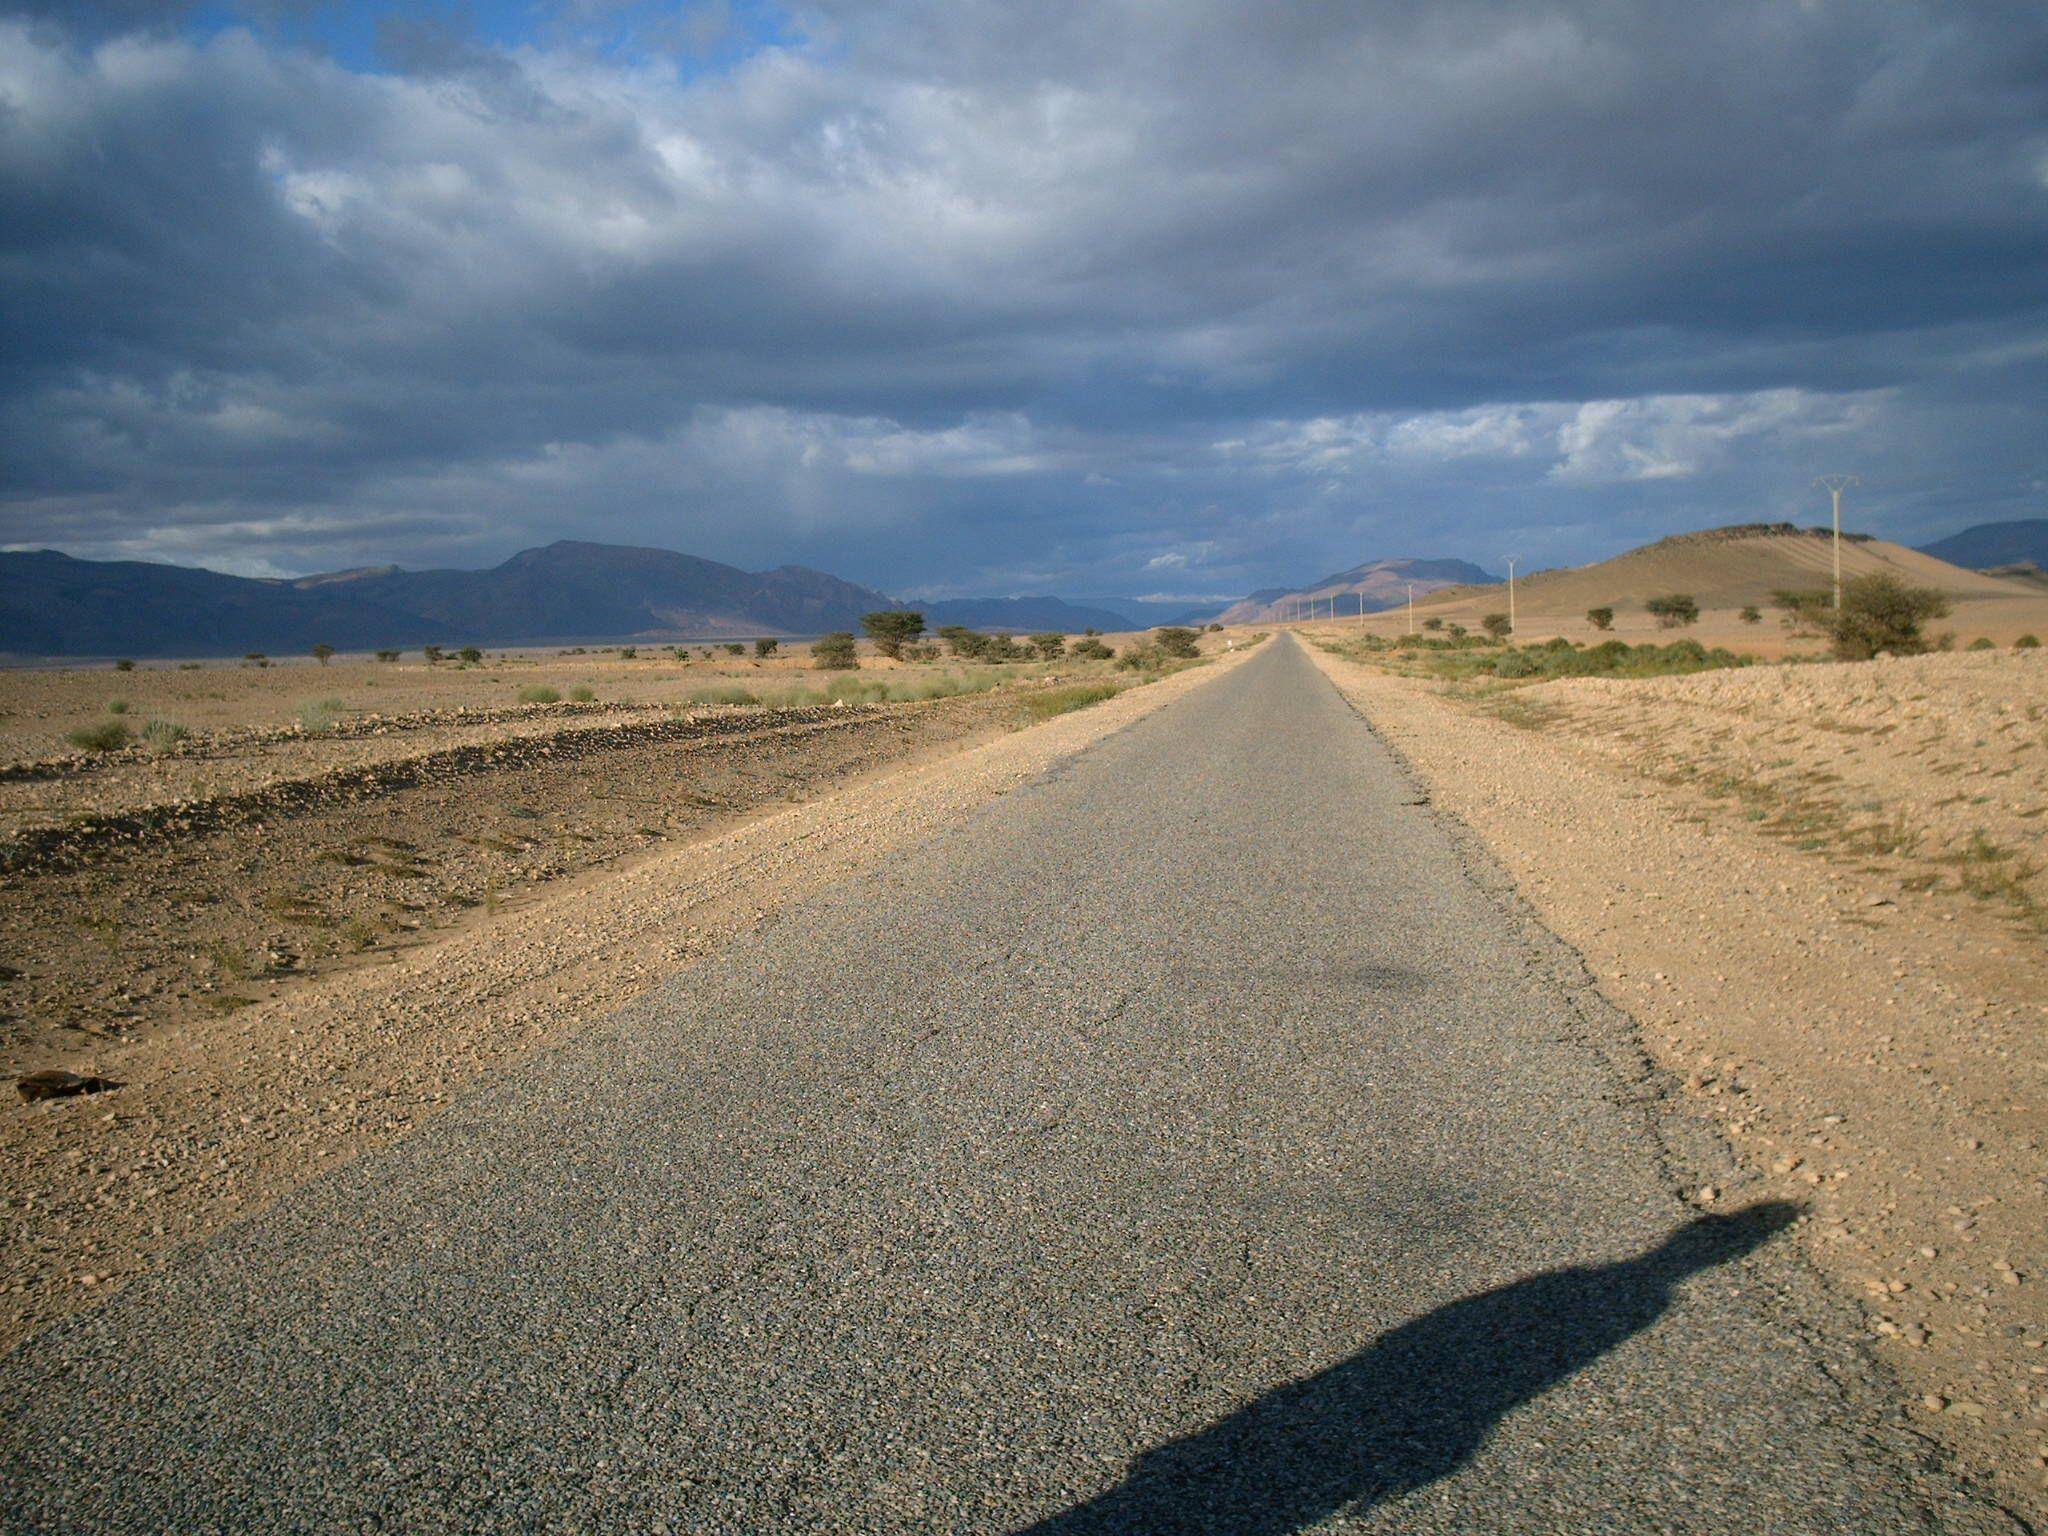 Road to akka oasis by harouib